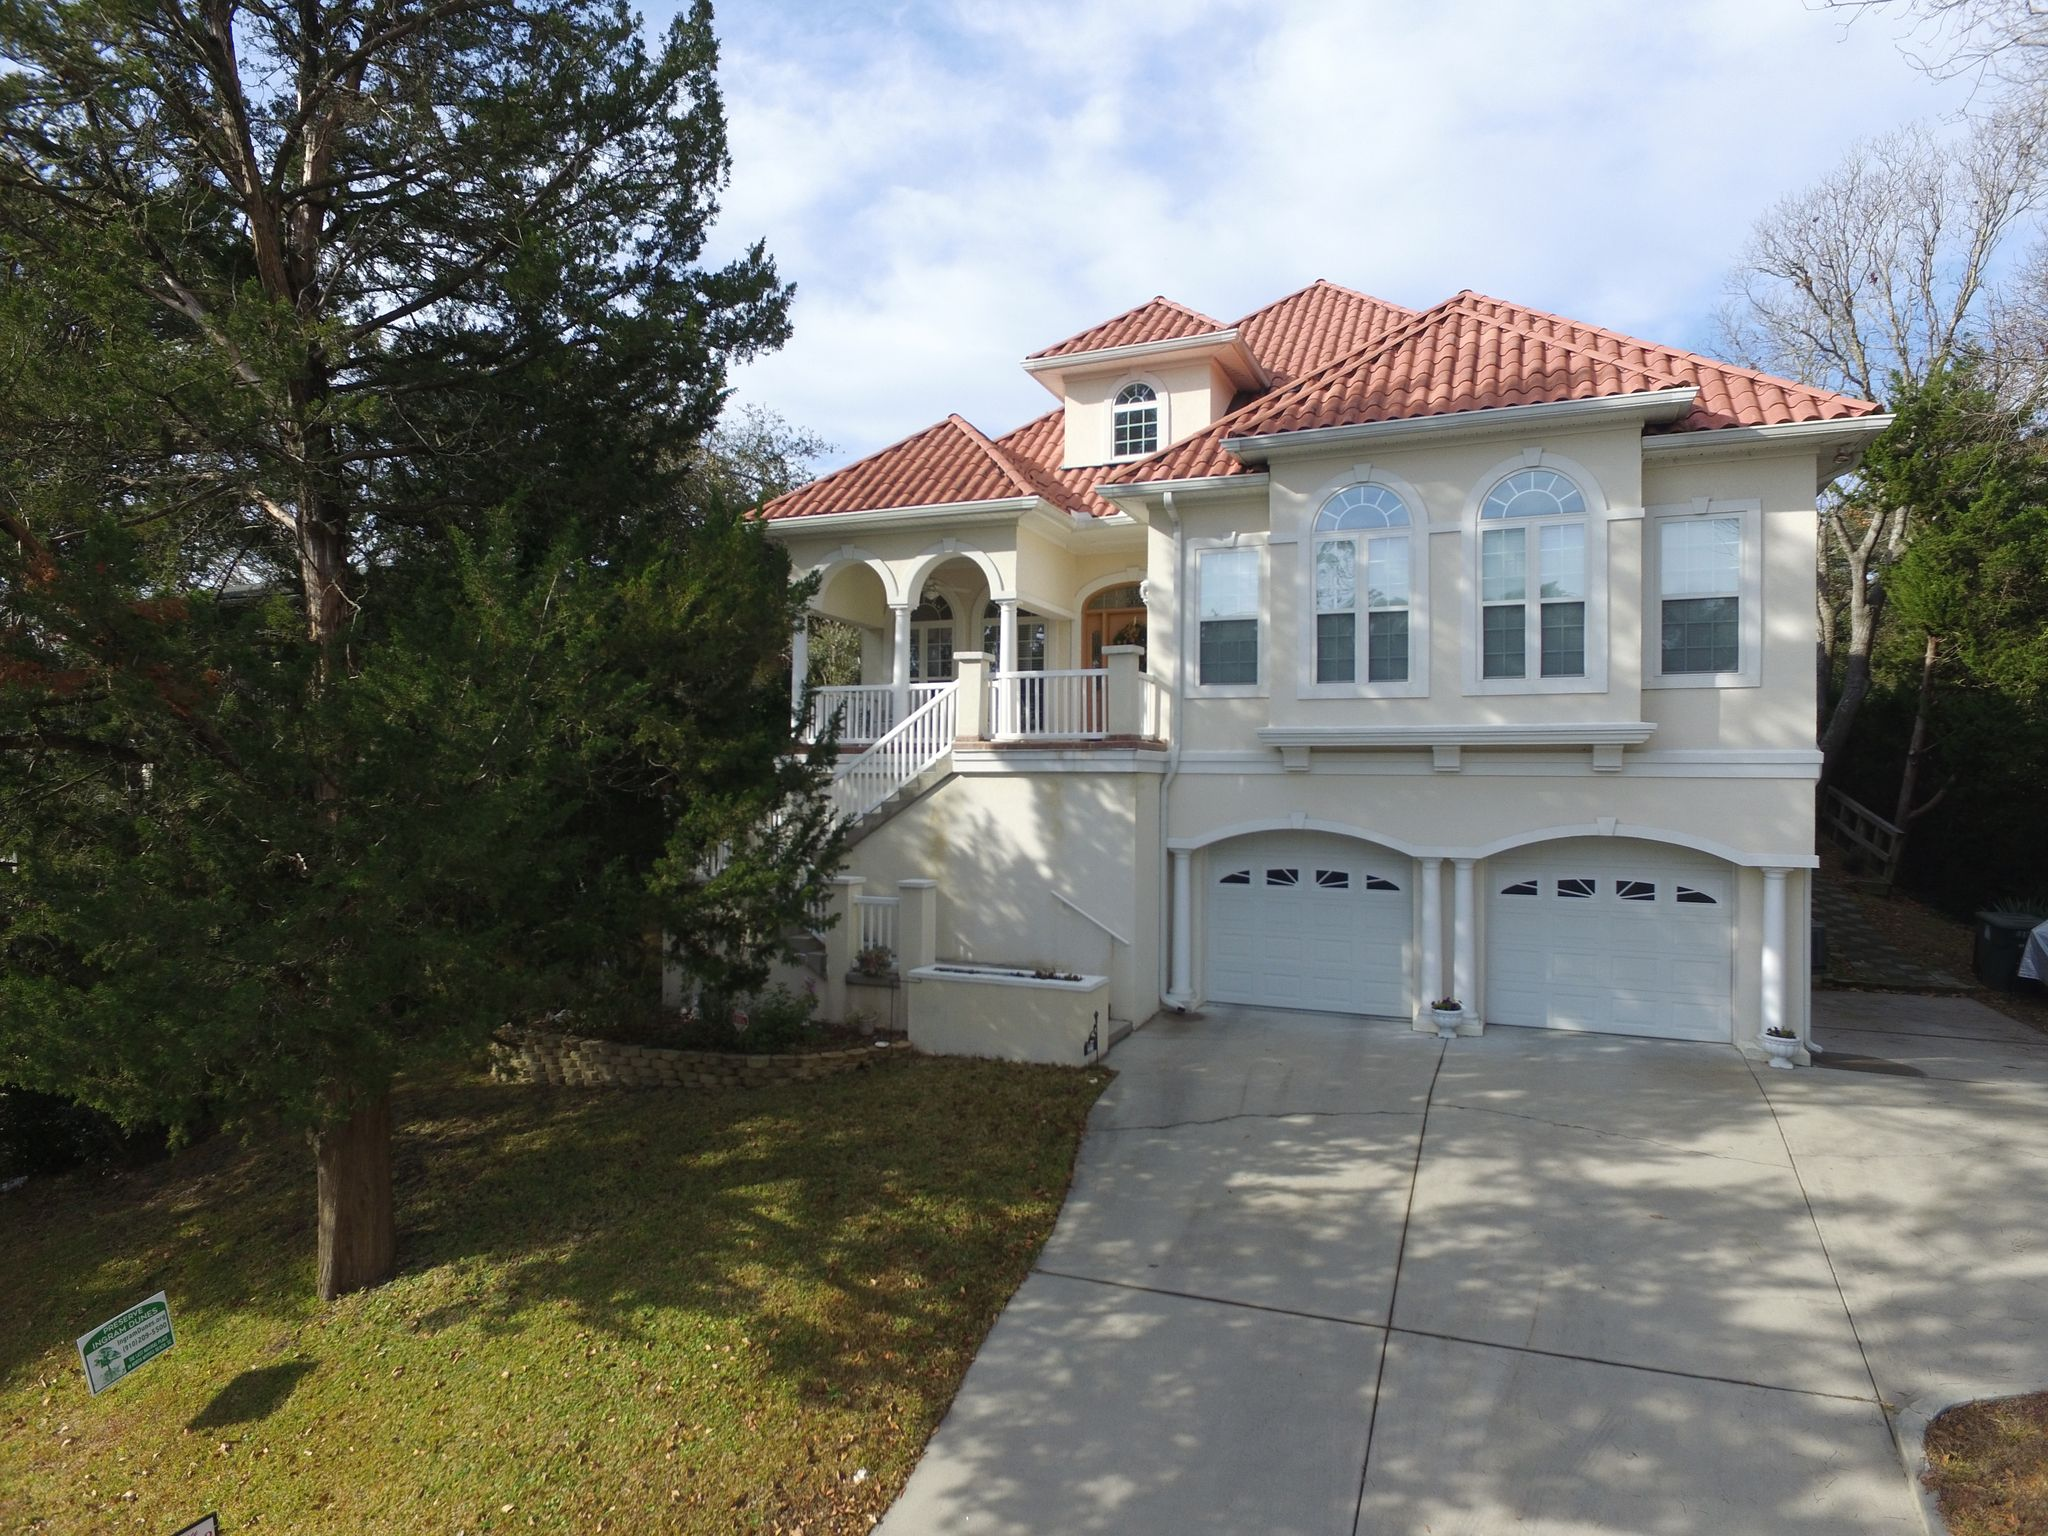 221 9th Ave S, North Myrtle Beach, SC 29582 - 3 Bed, 3 Bath Single-Family  Home - 45 Photos   Trulia